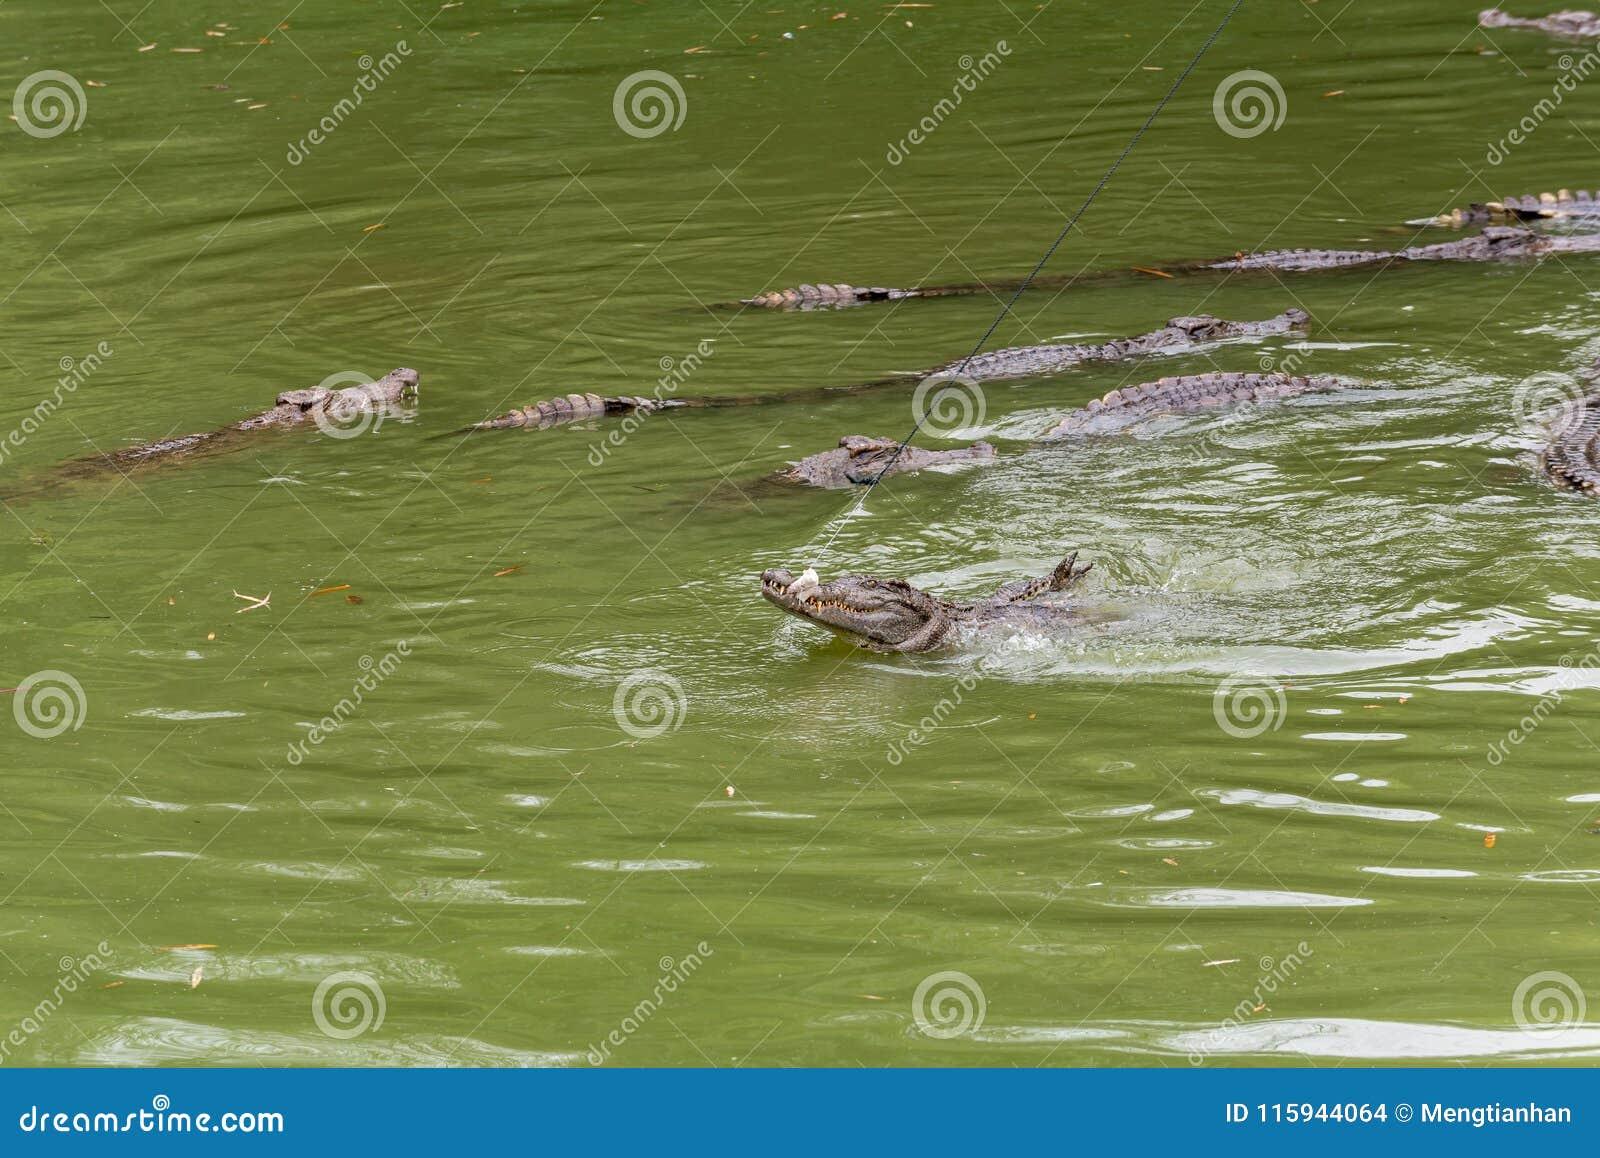 Бой для siamensis ед-крокодил-крокодила